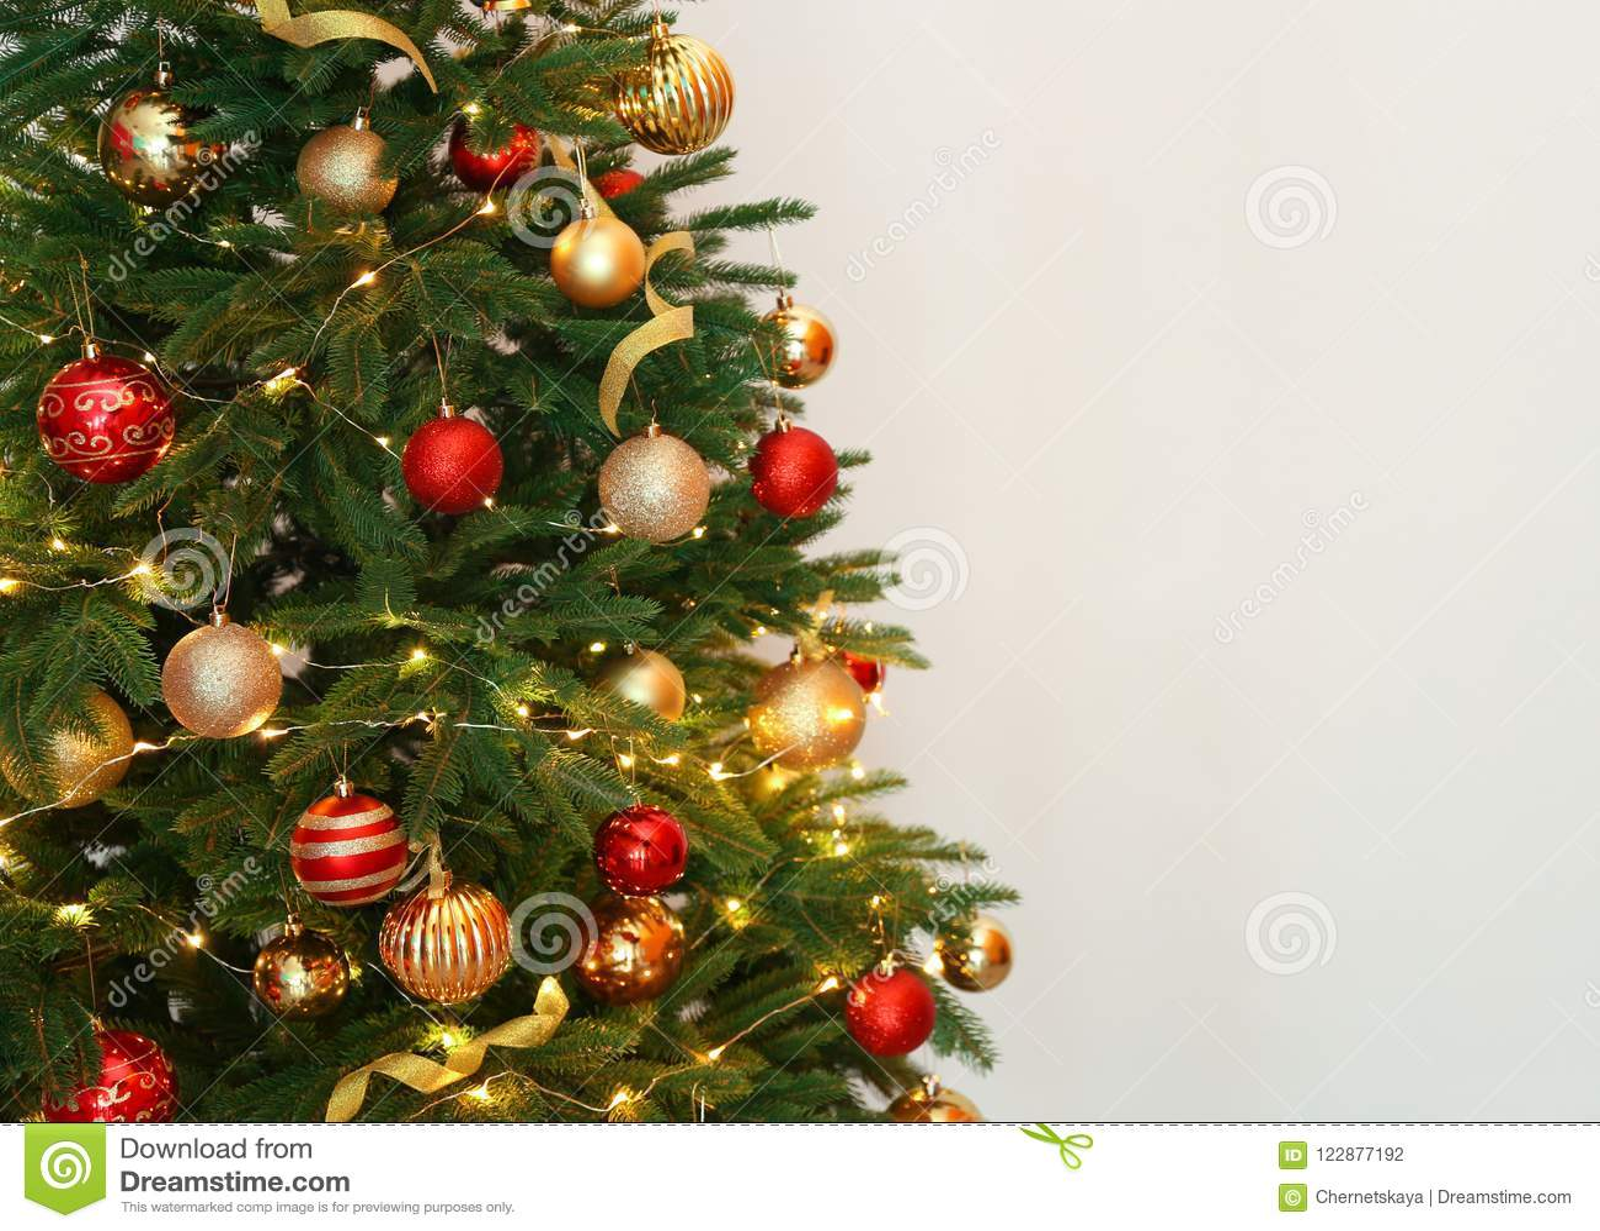 Beautiful Christmas Tree With Fairy Lights And Festive Decor